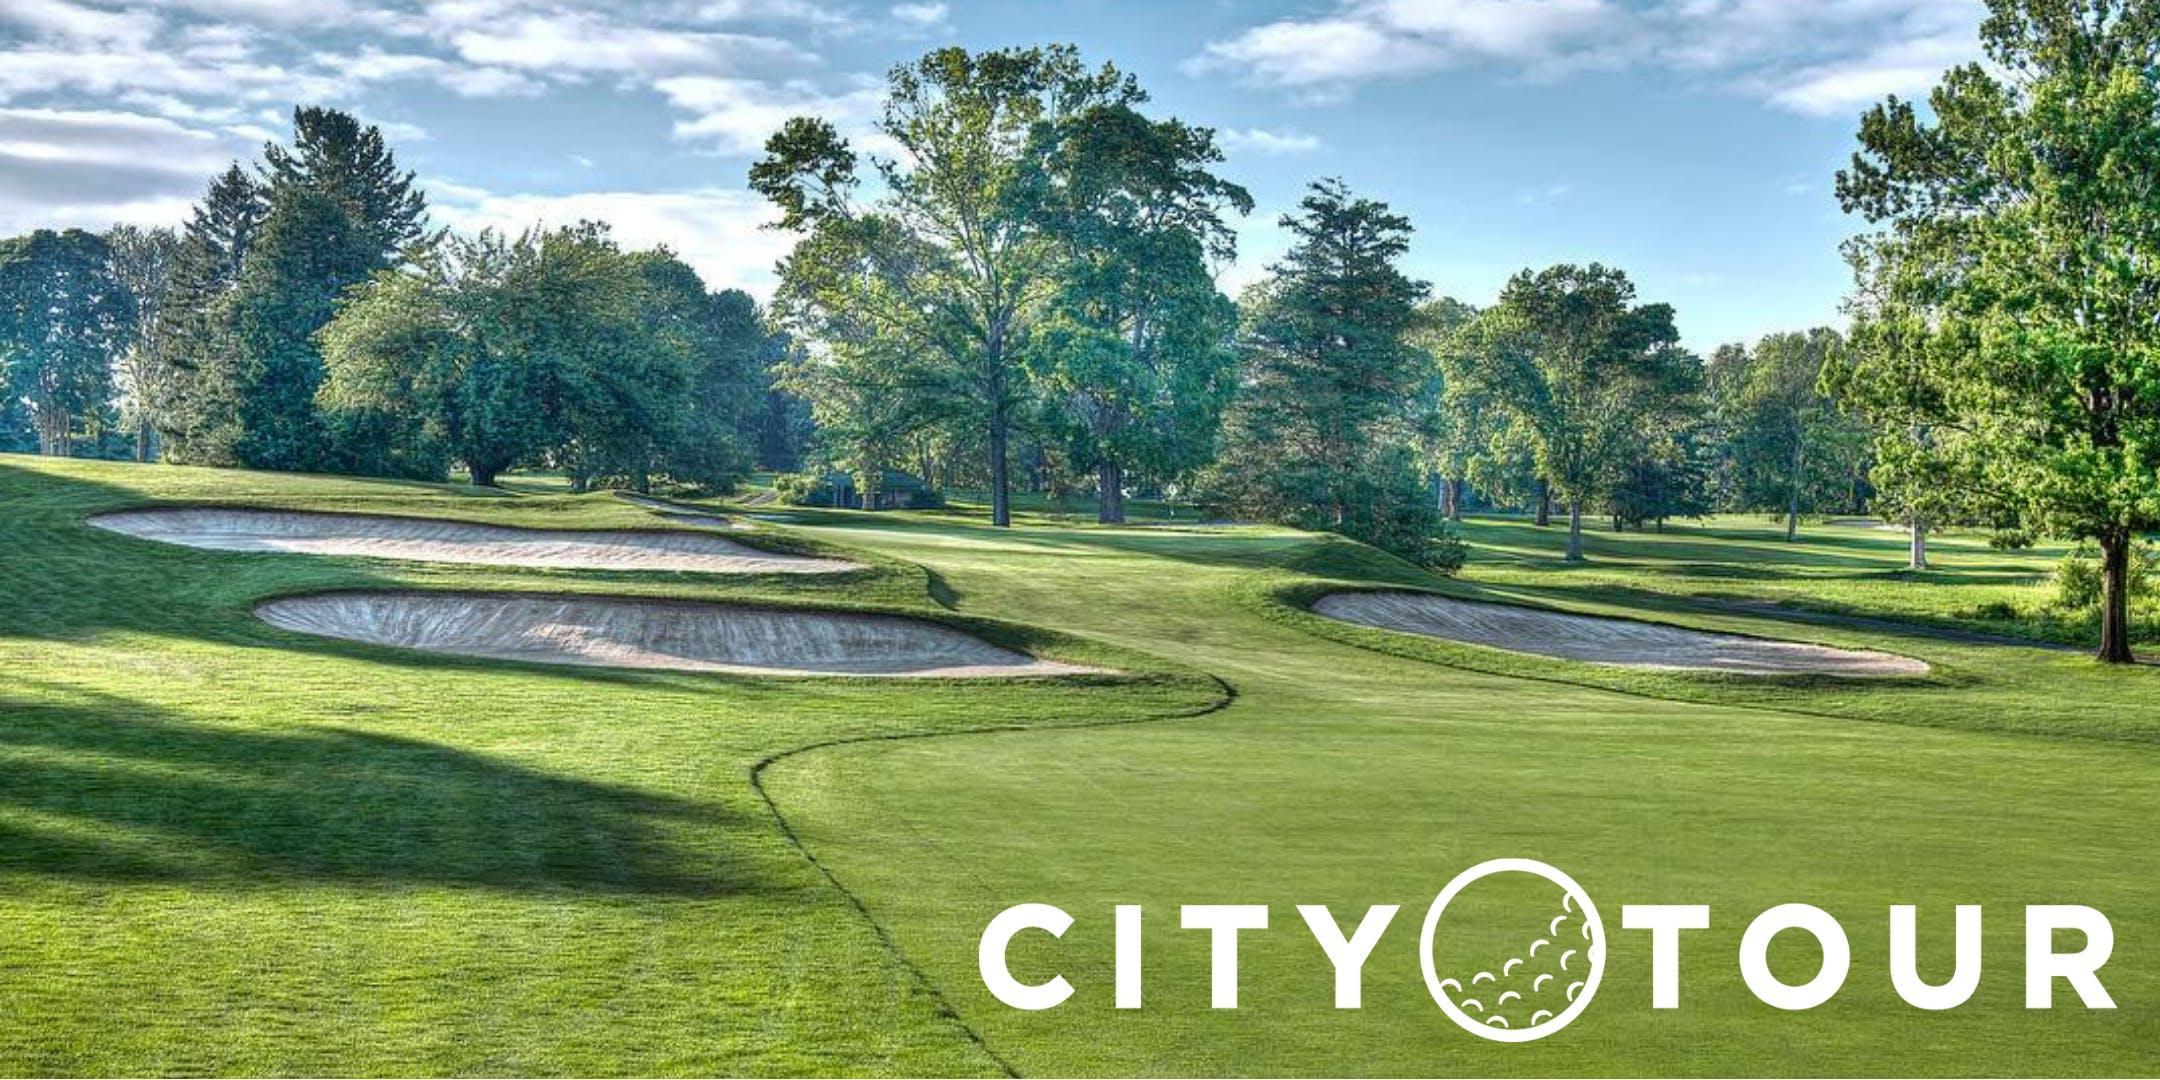 Cincinnati City Tour - Stonelick Hills Golf Club